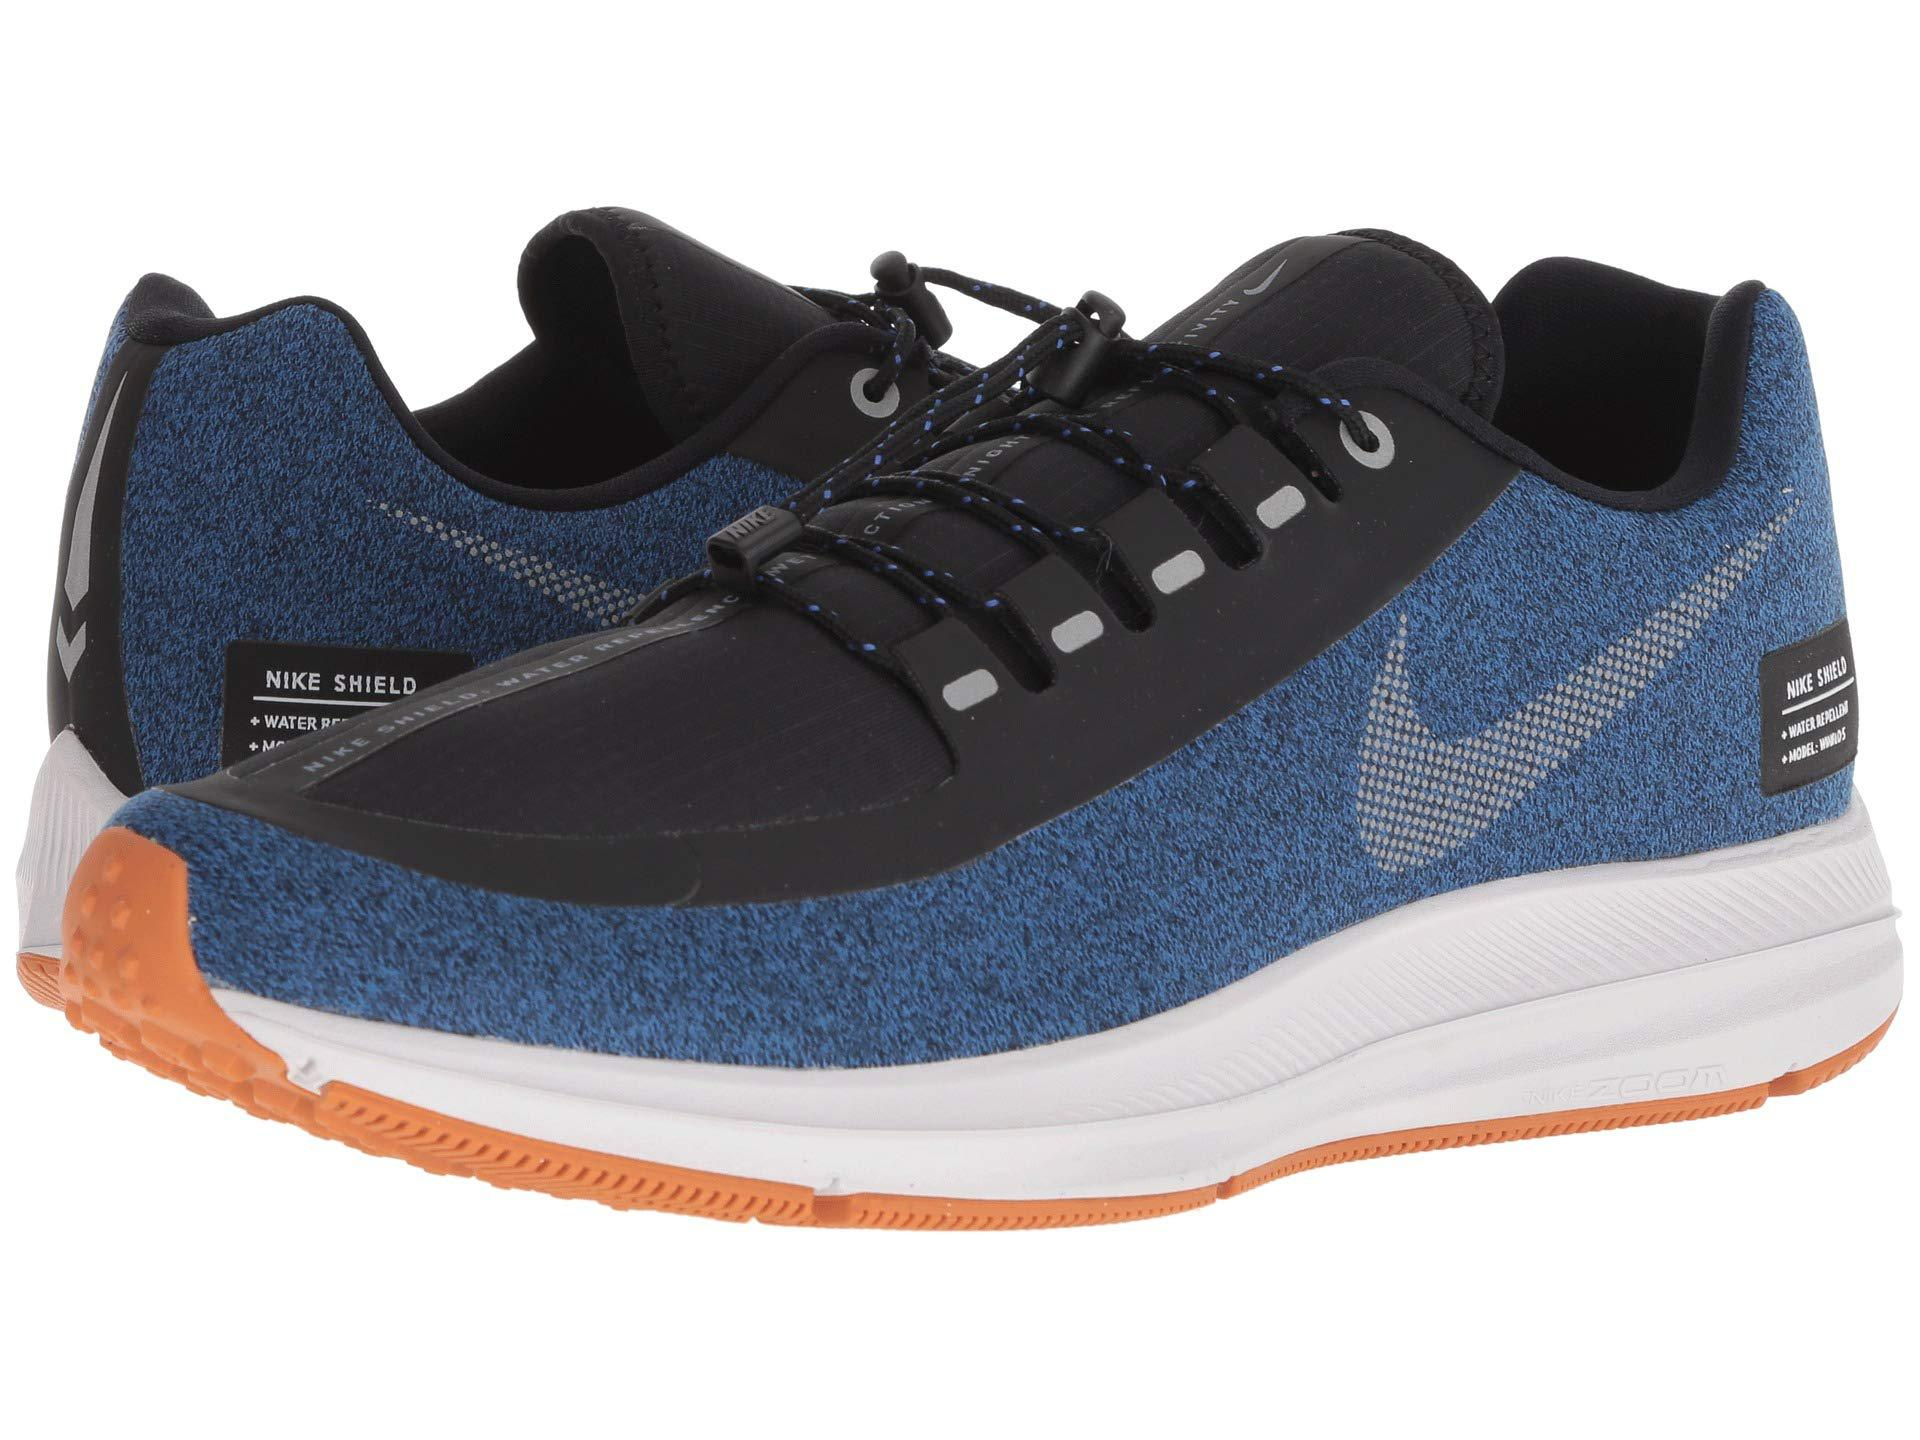 8613c69350680f Lyst - Nike Air Zoom Winflo 5 Run Shield (black metallic Silver ...